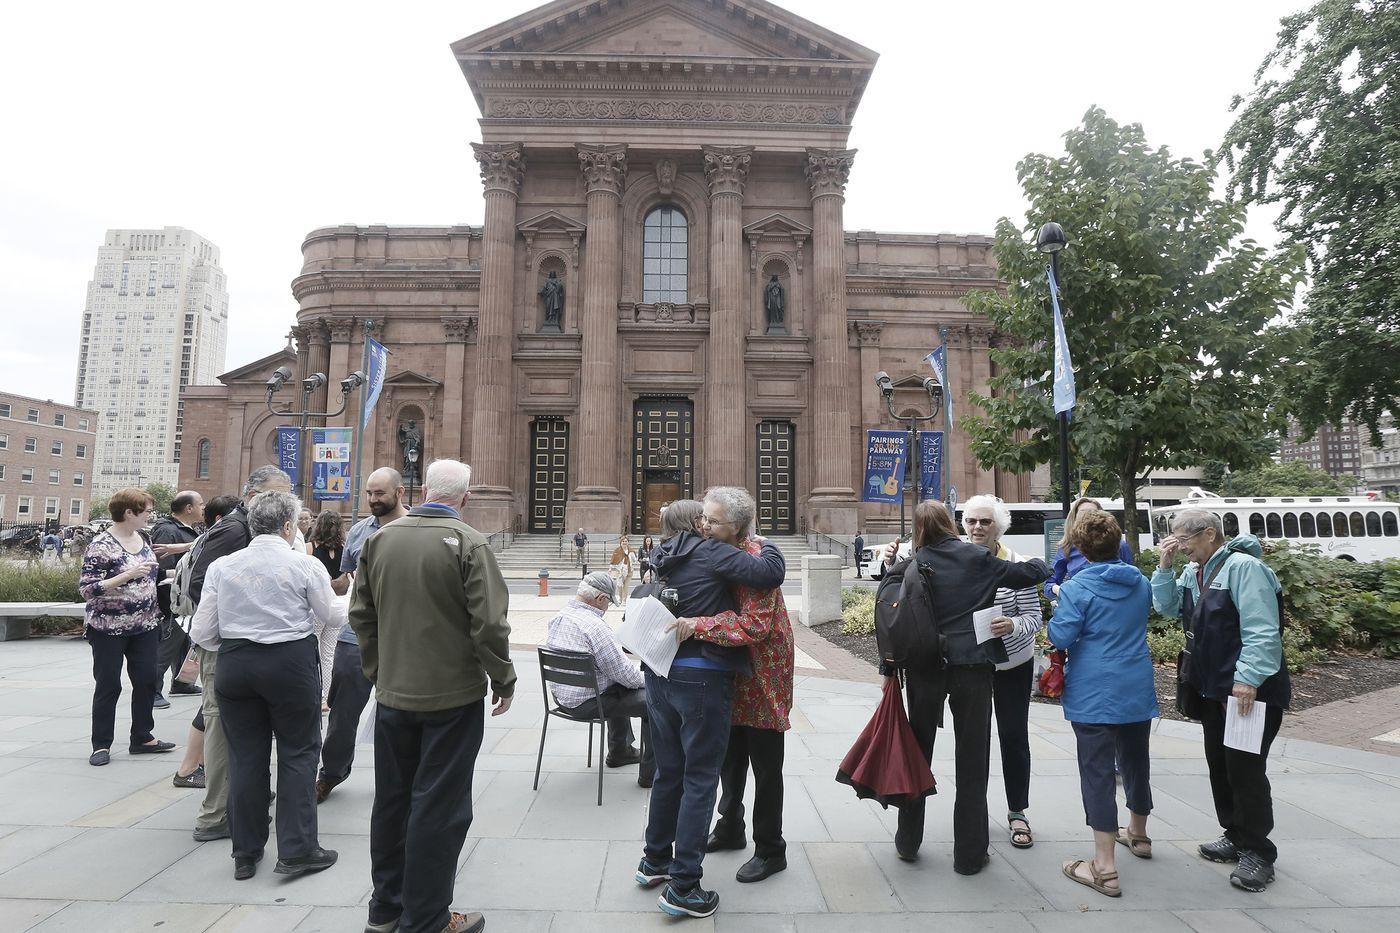 Catholics seeking reform gather to pray, decry grand jury sex-abuse report